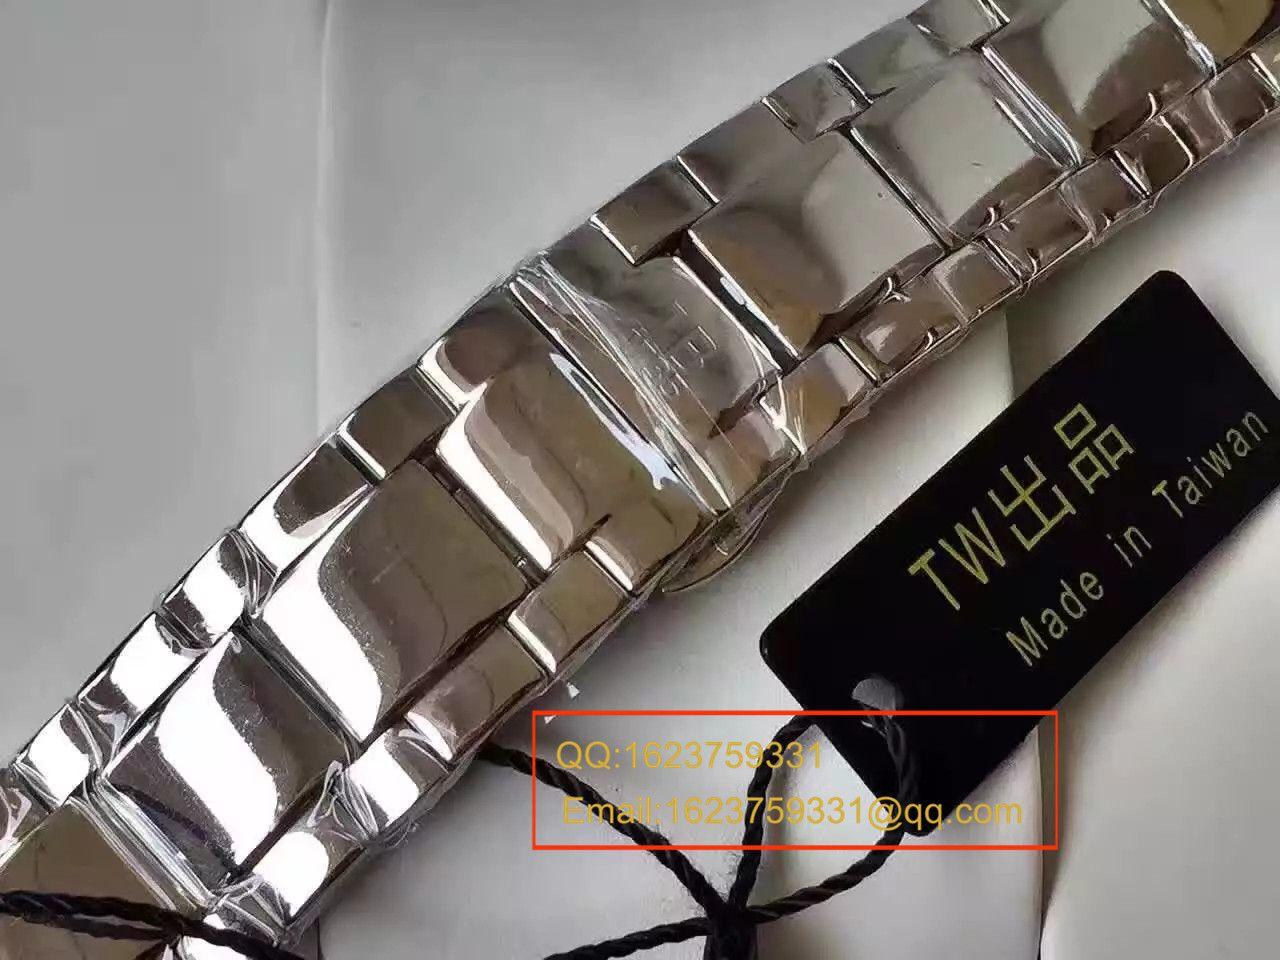 【TW厂一比一复刻手表】宝珀Blancpain 五十噚系列 超薄机芯系列5085F-1130-71 腕表 / BP009